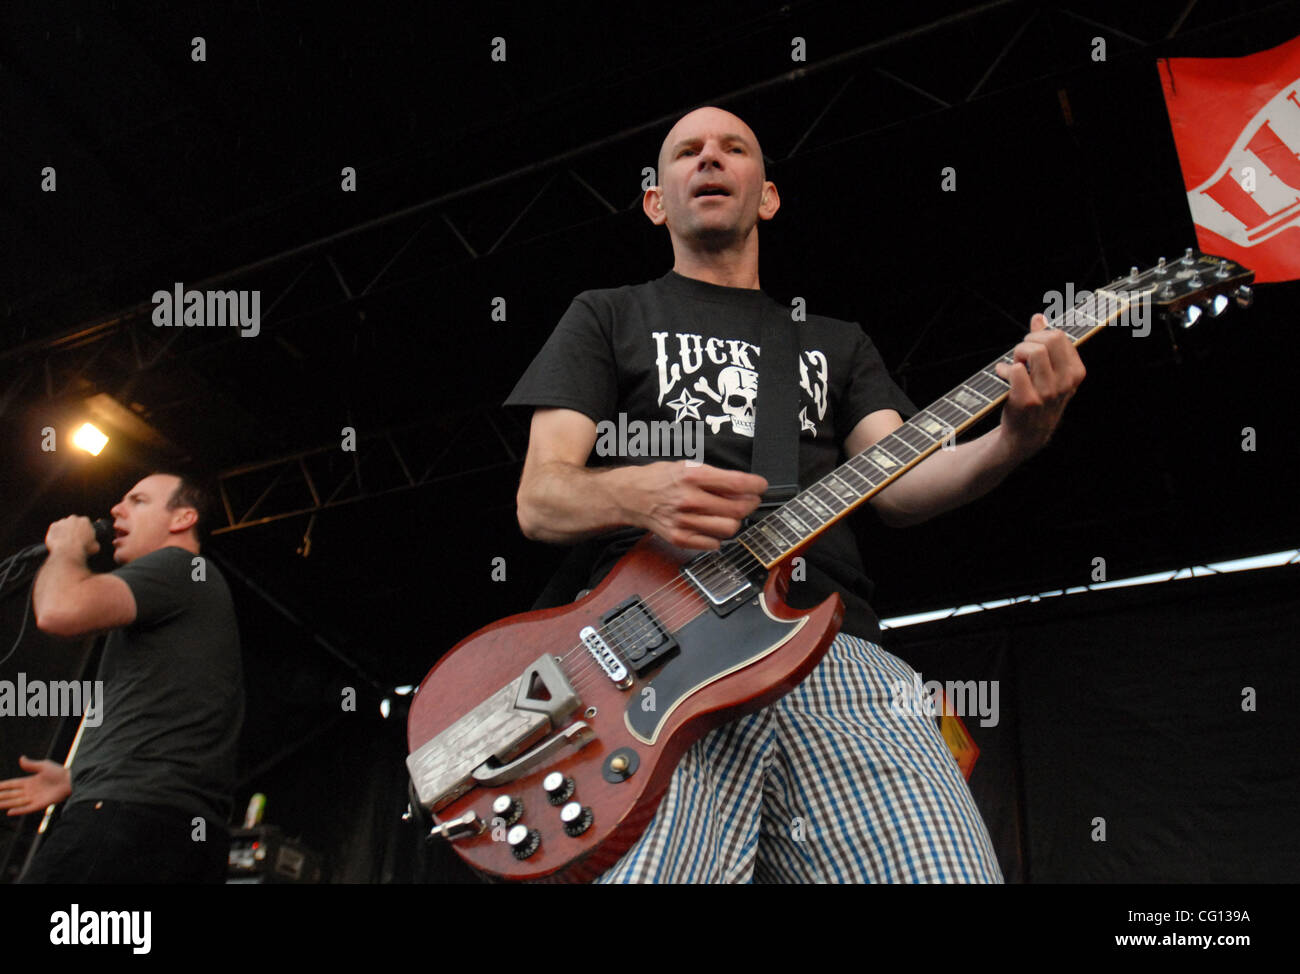 Jul. 23, 2007; Charlotte, NC USA; Singer GREG GRAFFIN and Guitarist GREG HETSON of the band BAD RELIGION performs - Stock Image